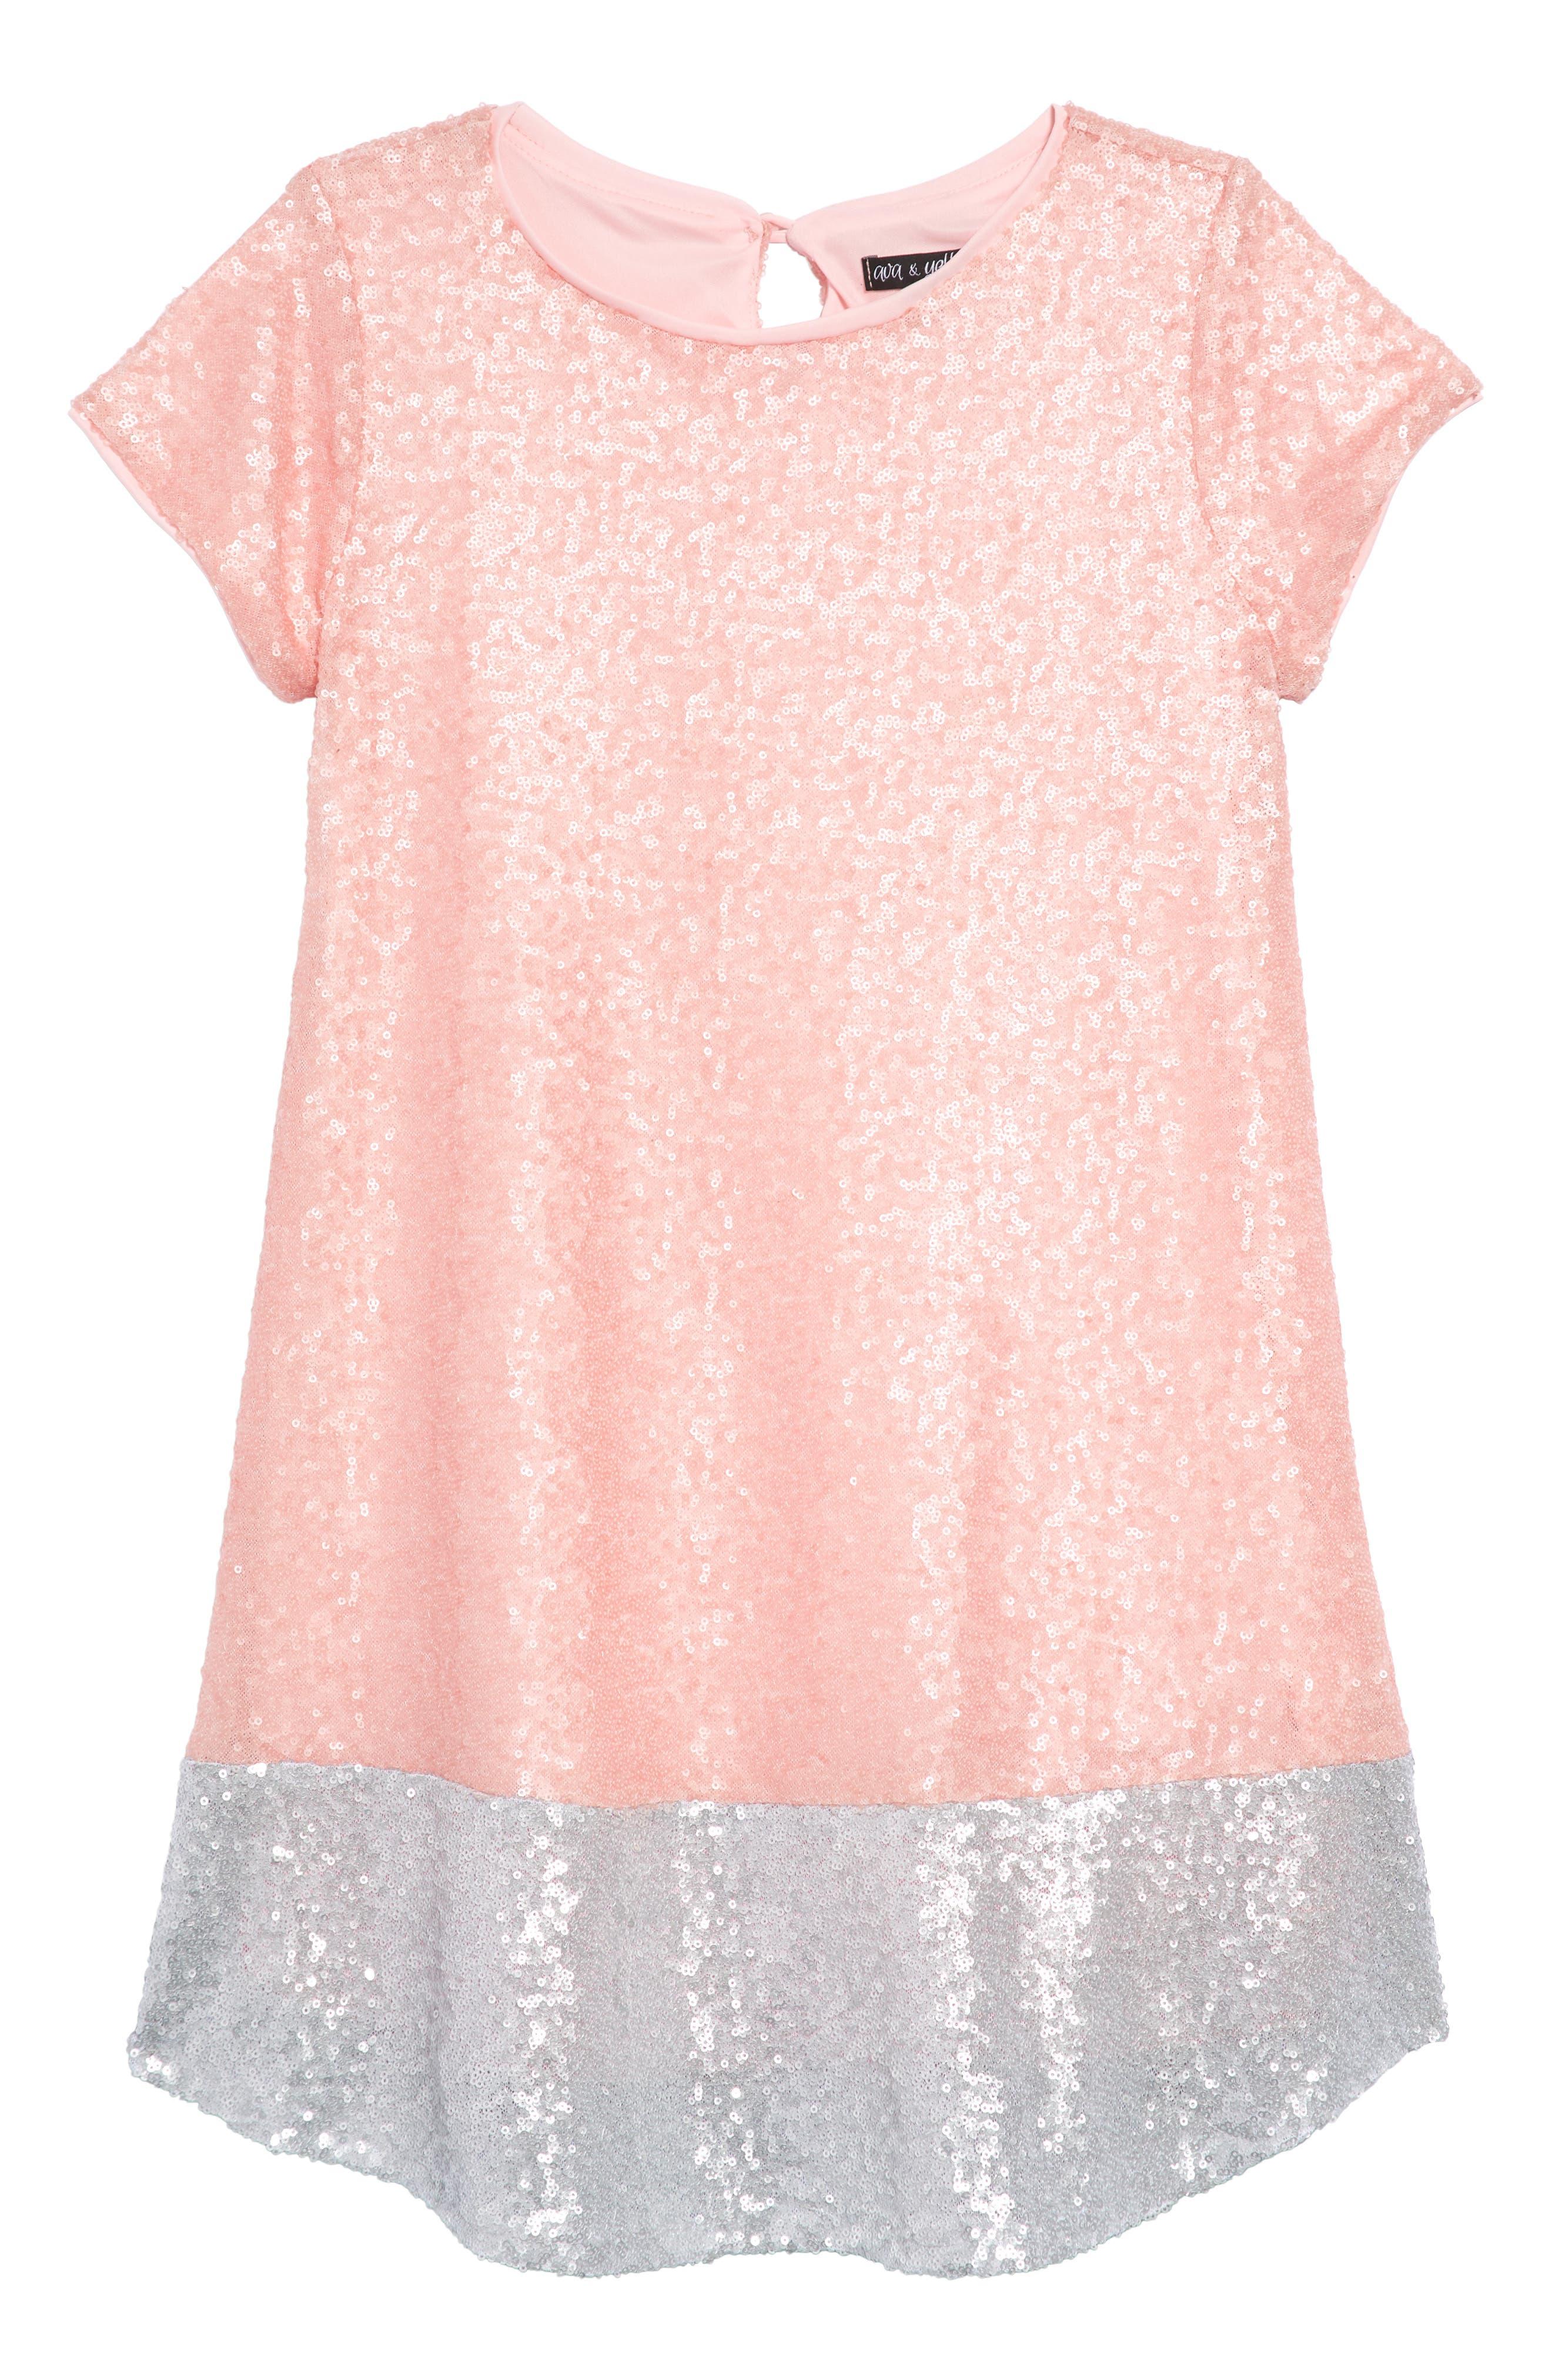 Sequin Shift Dress,                             Main thumbnail 1, color,                             Pink/ Silver